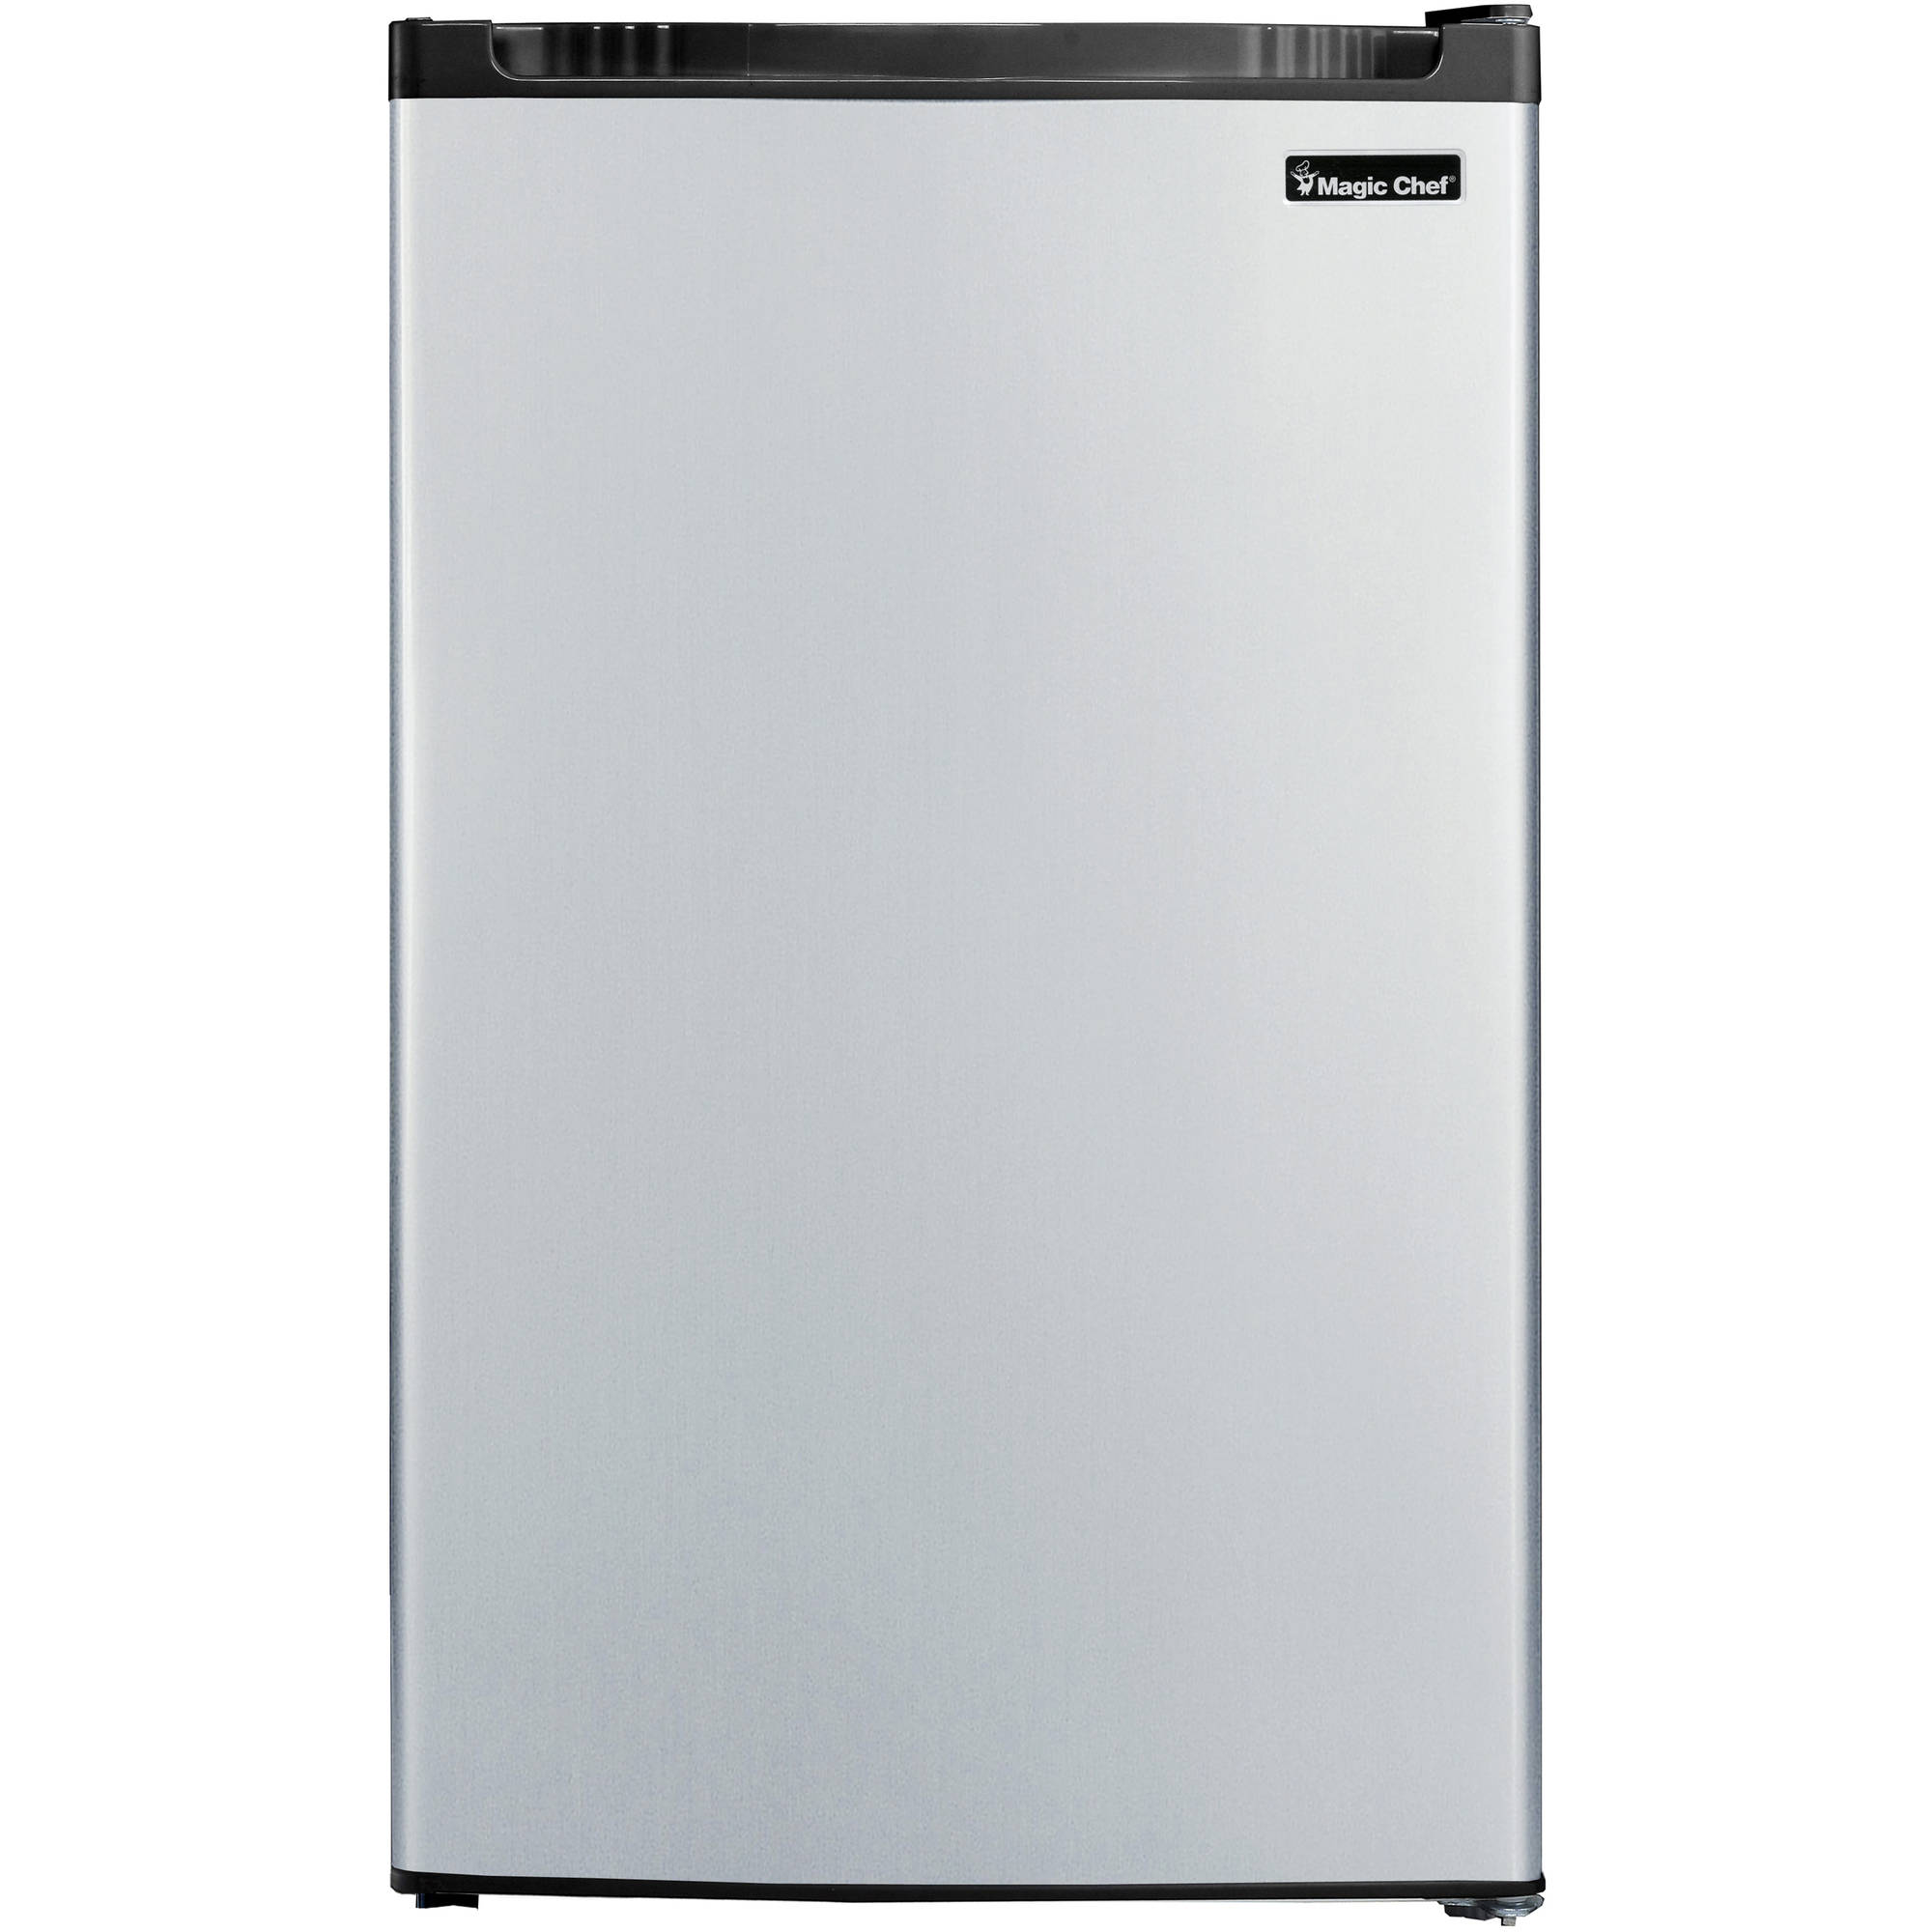 Magic Chef 4.4 cu ft Refrigerator